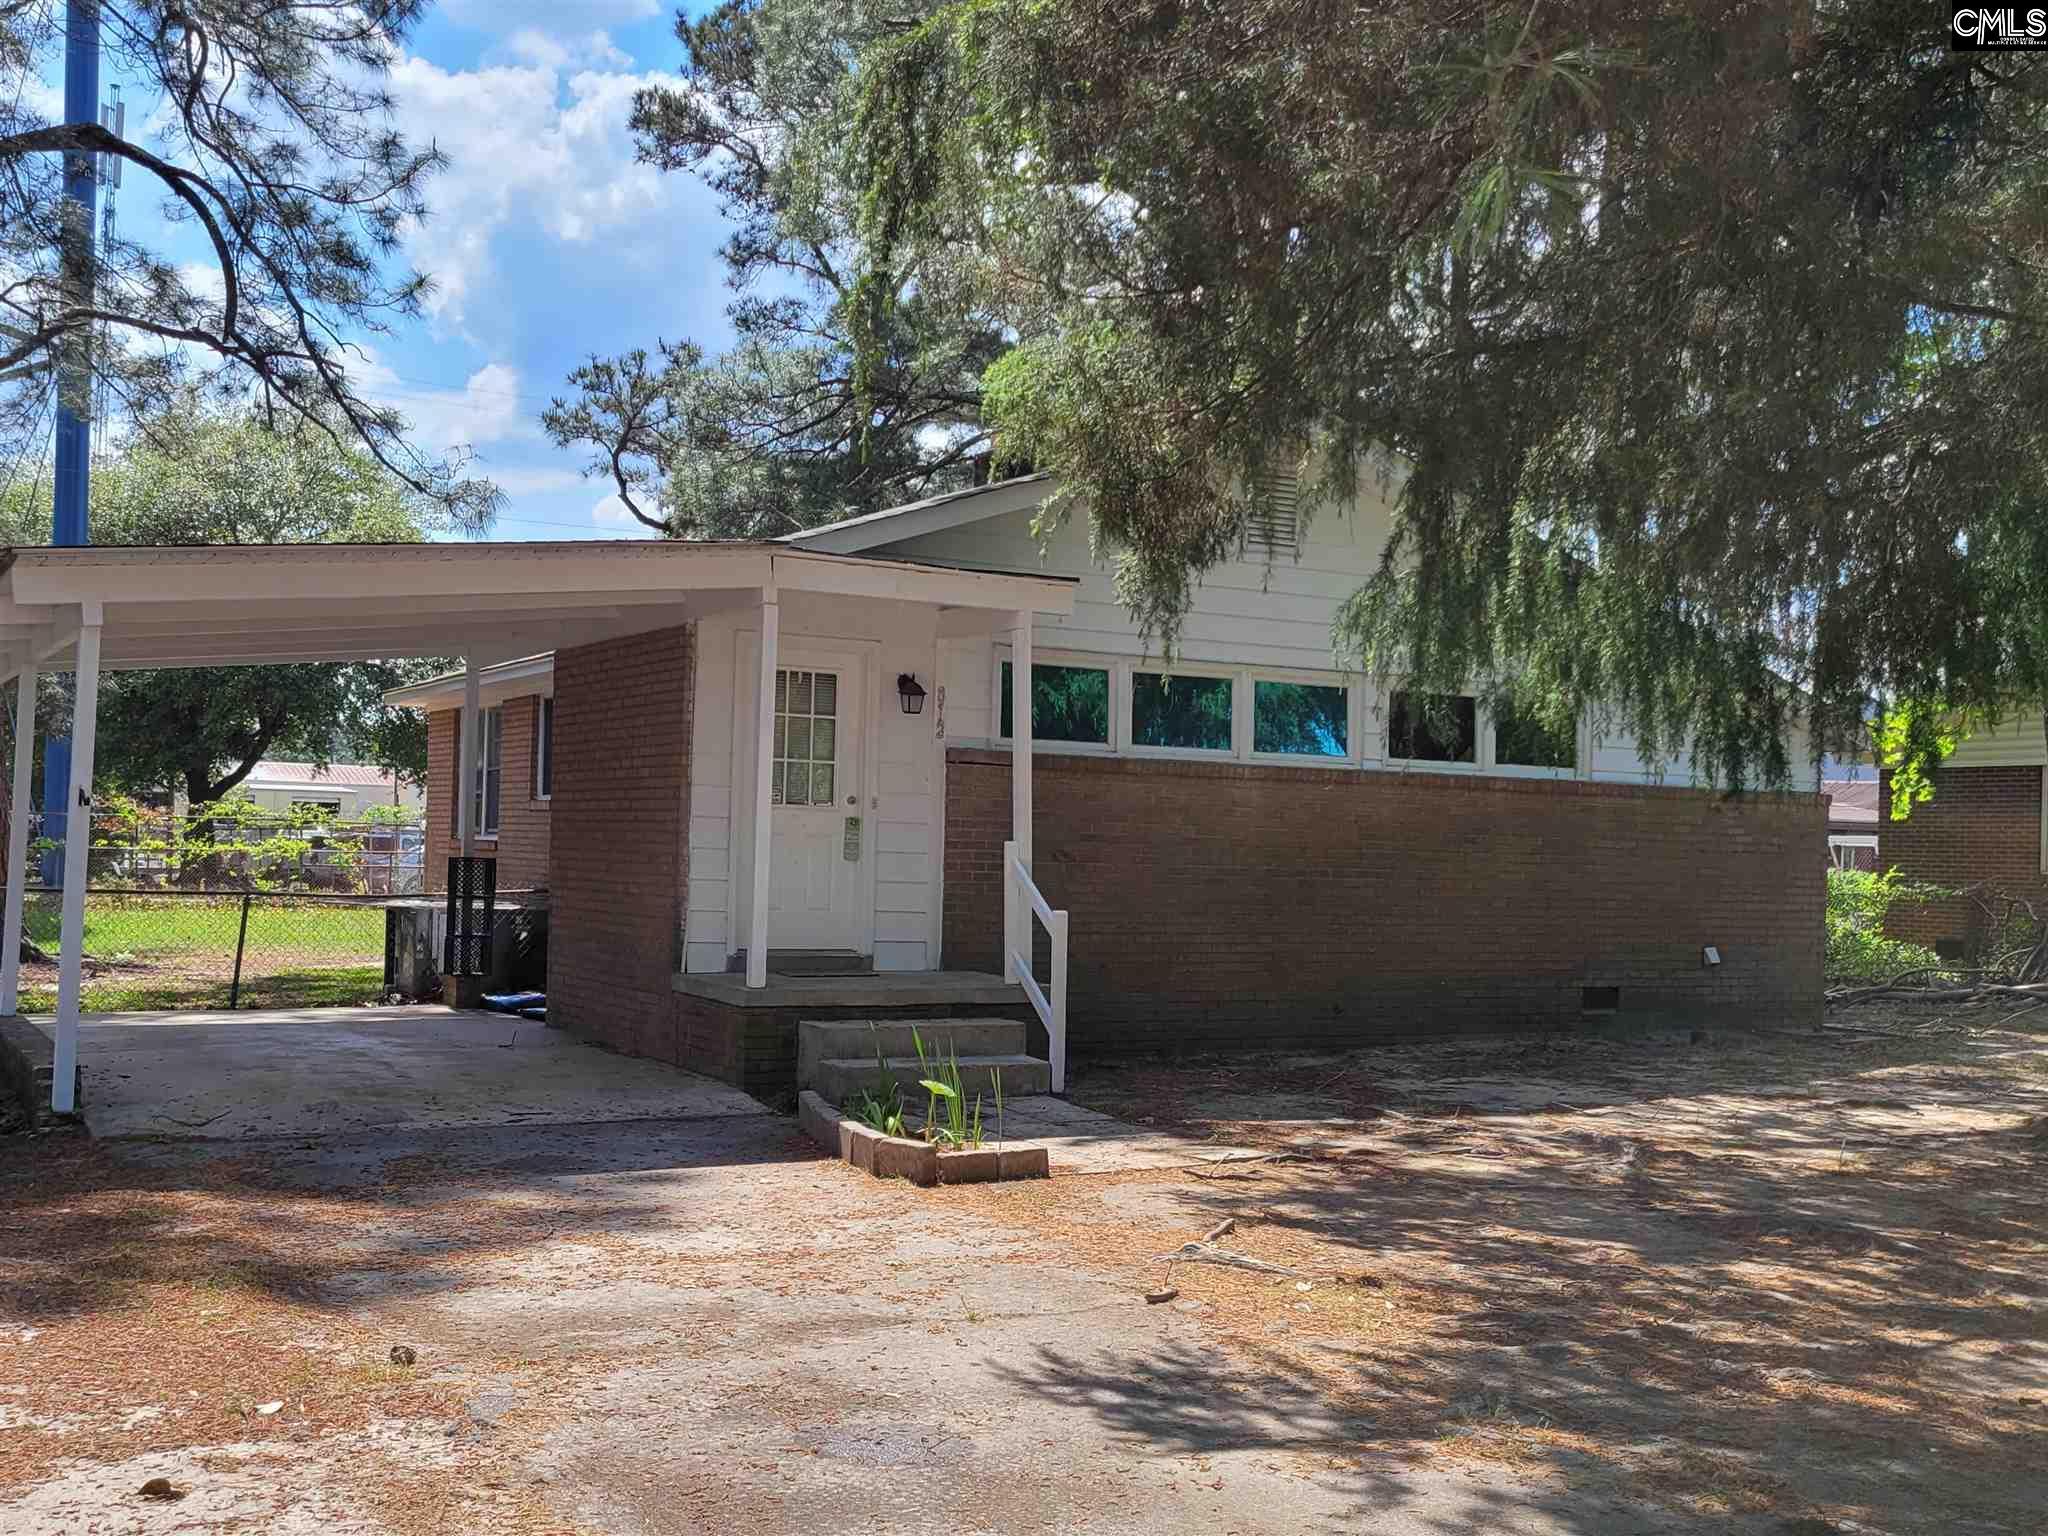 812 Knapp Street West Columbia, SC 29169-5022